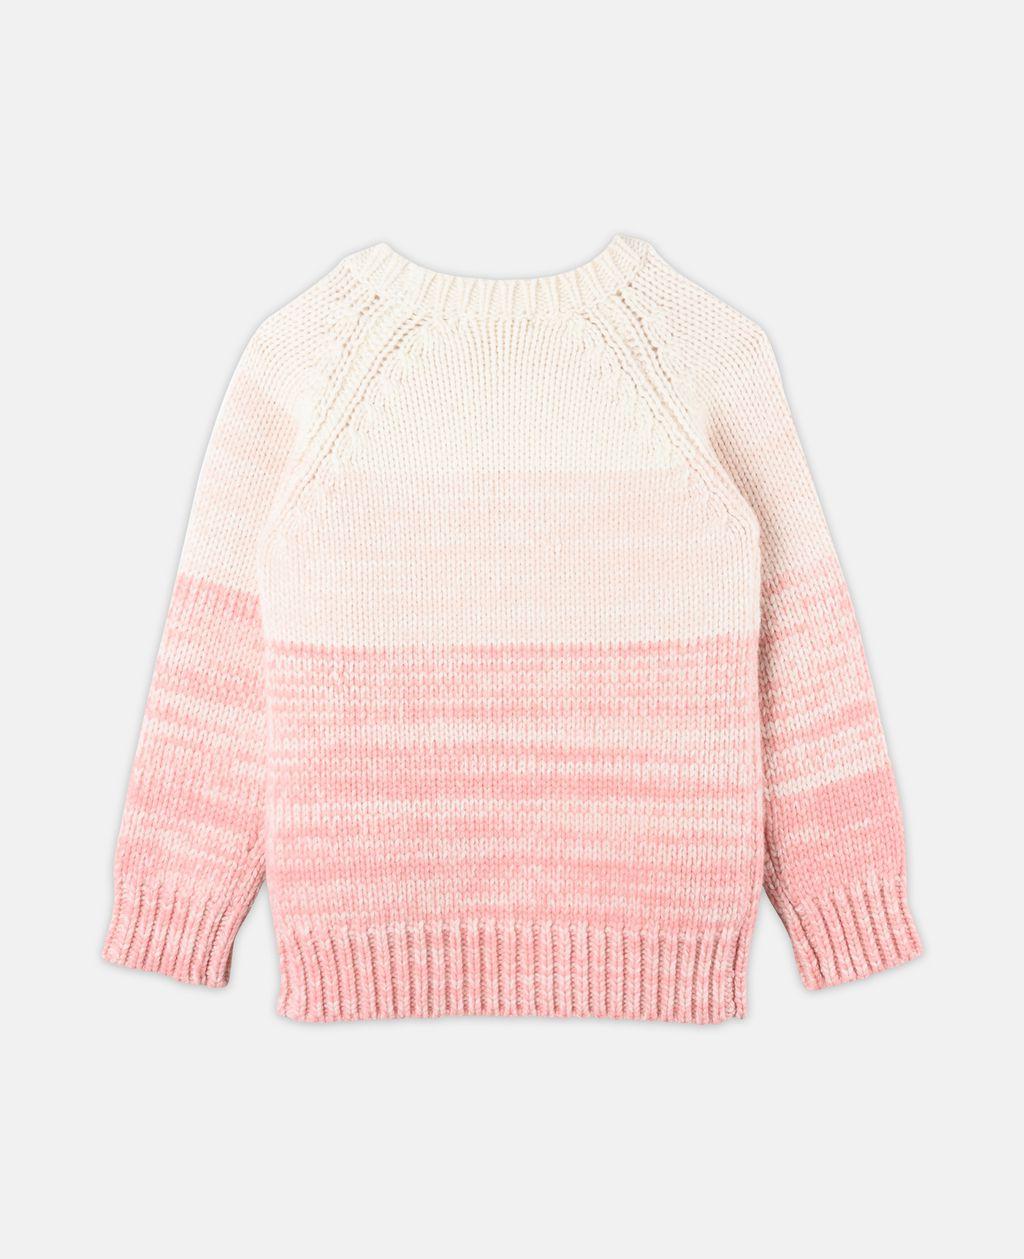 Freddie Pink Knit Sweater - STELLA MCCARTNEY KIDS